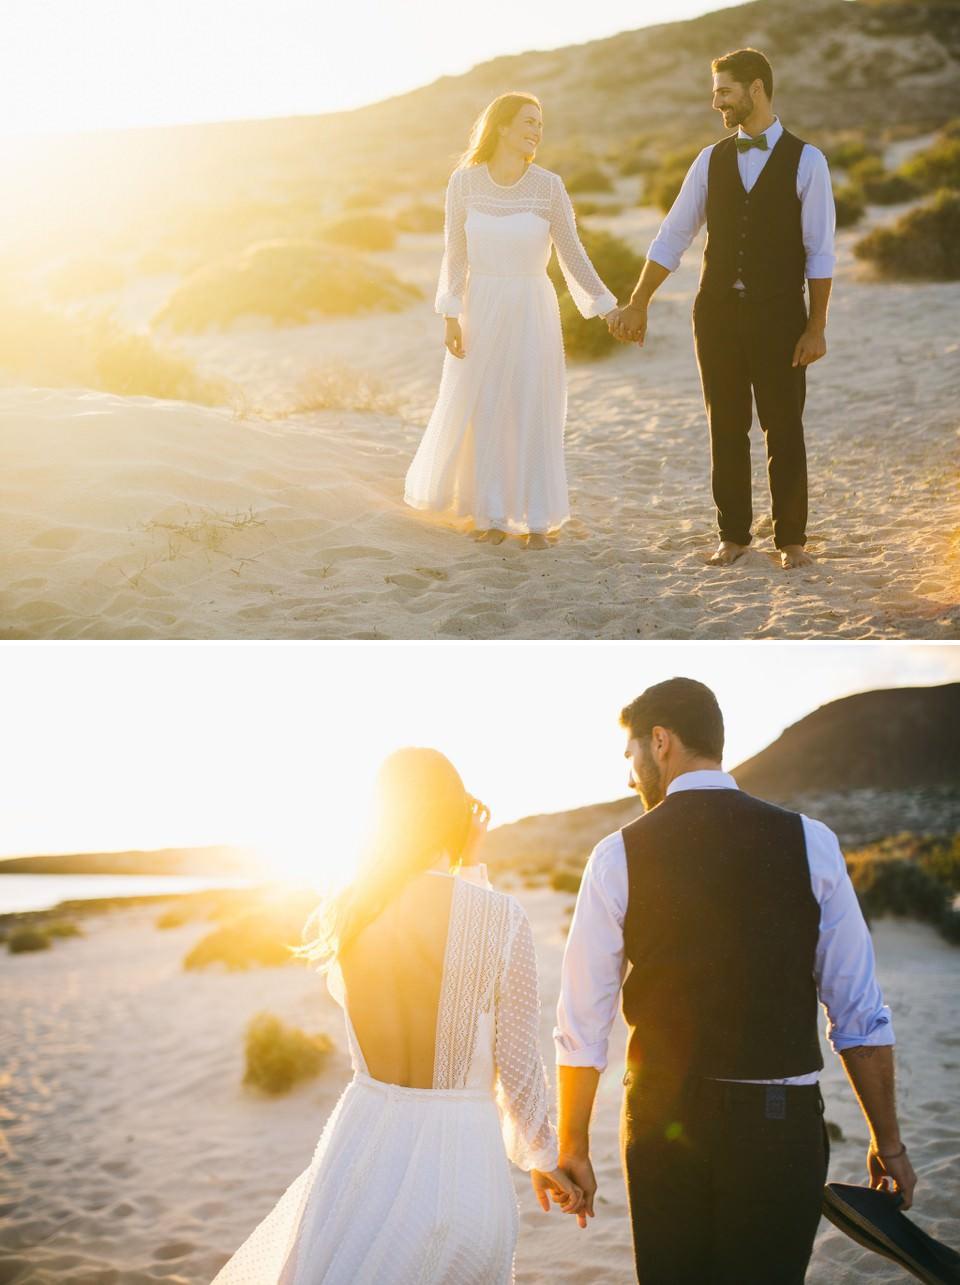 FORMA Photography   Fotograf Elopement und Intime Hochzeiten   Wedding photographer elopements and intimate weddings